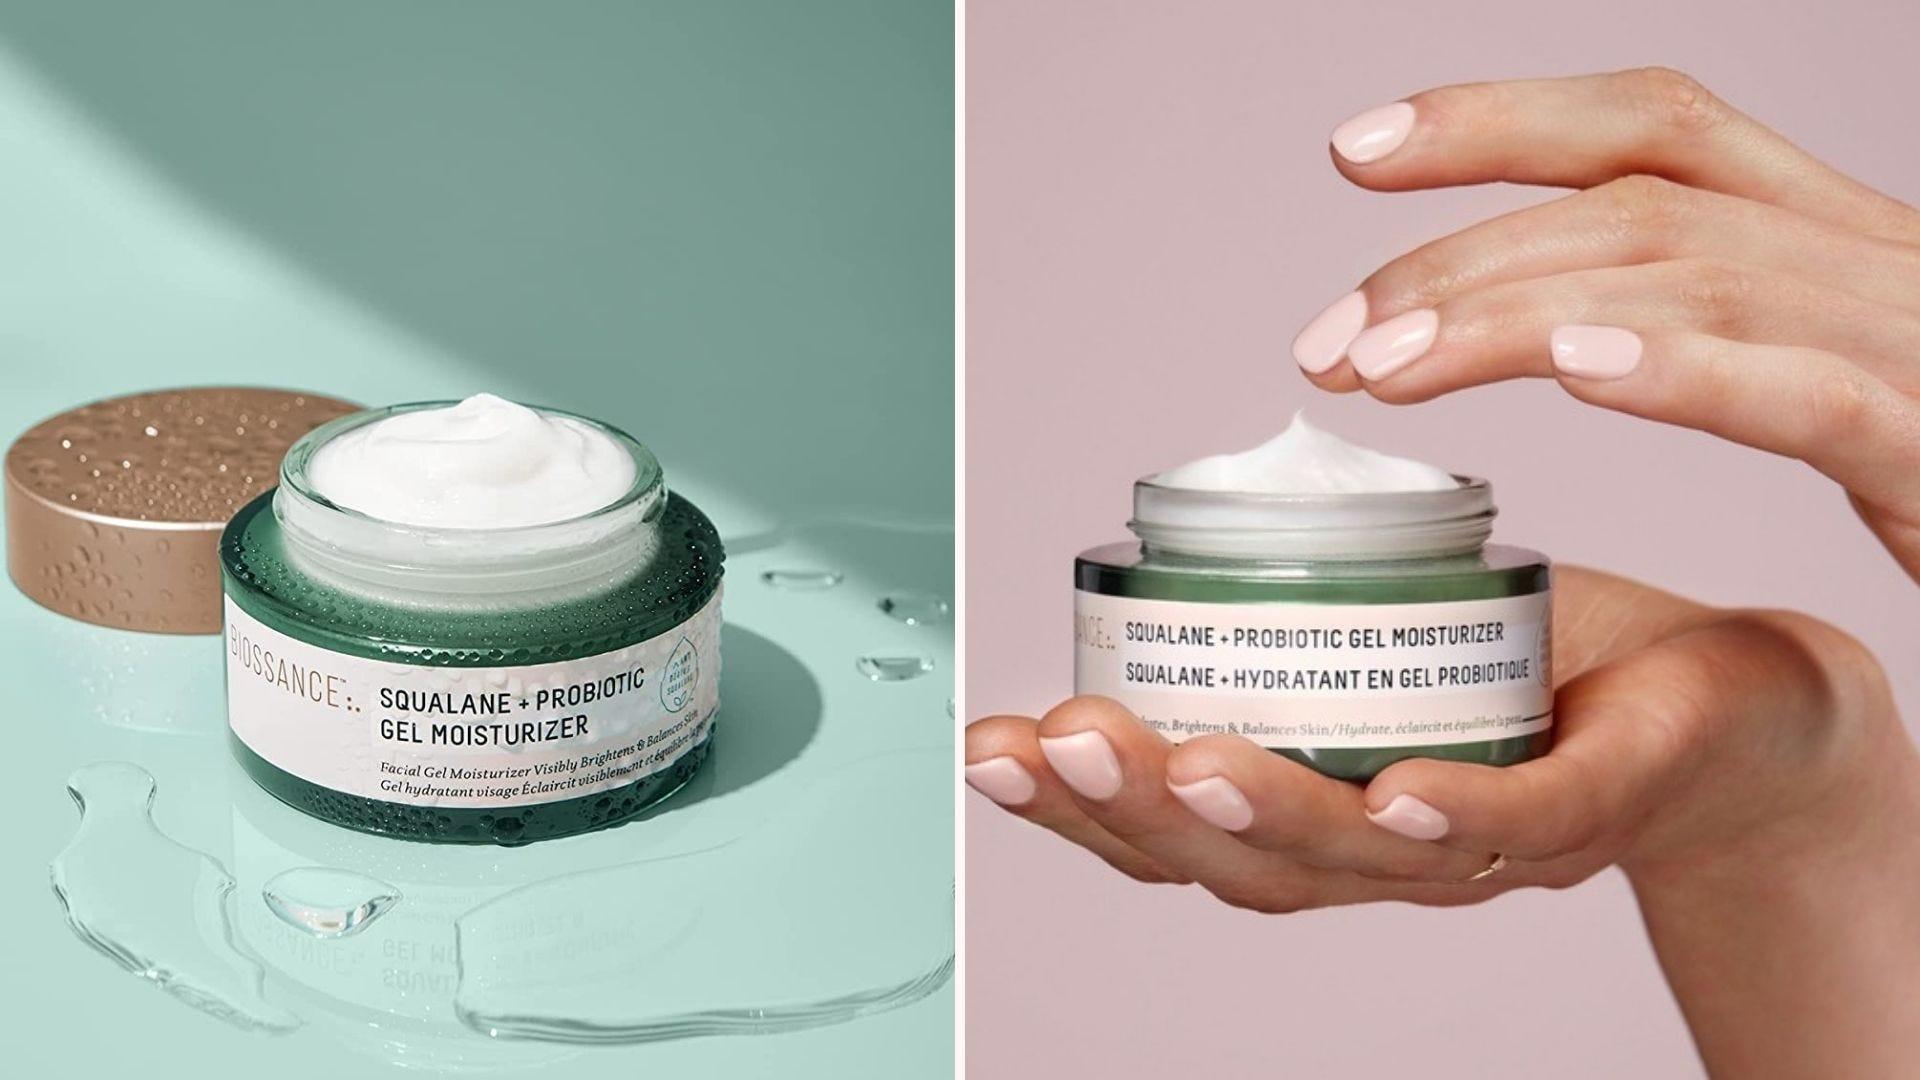 An open green jar with white gel inside; a pair of hands holding an open jar of moisturizer